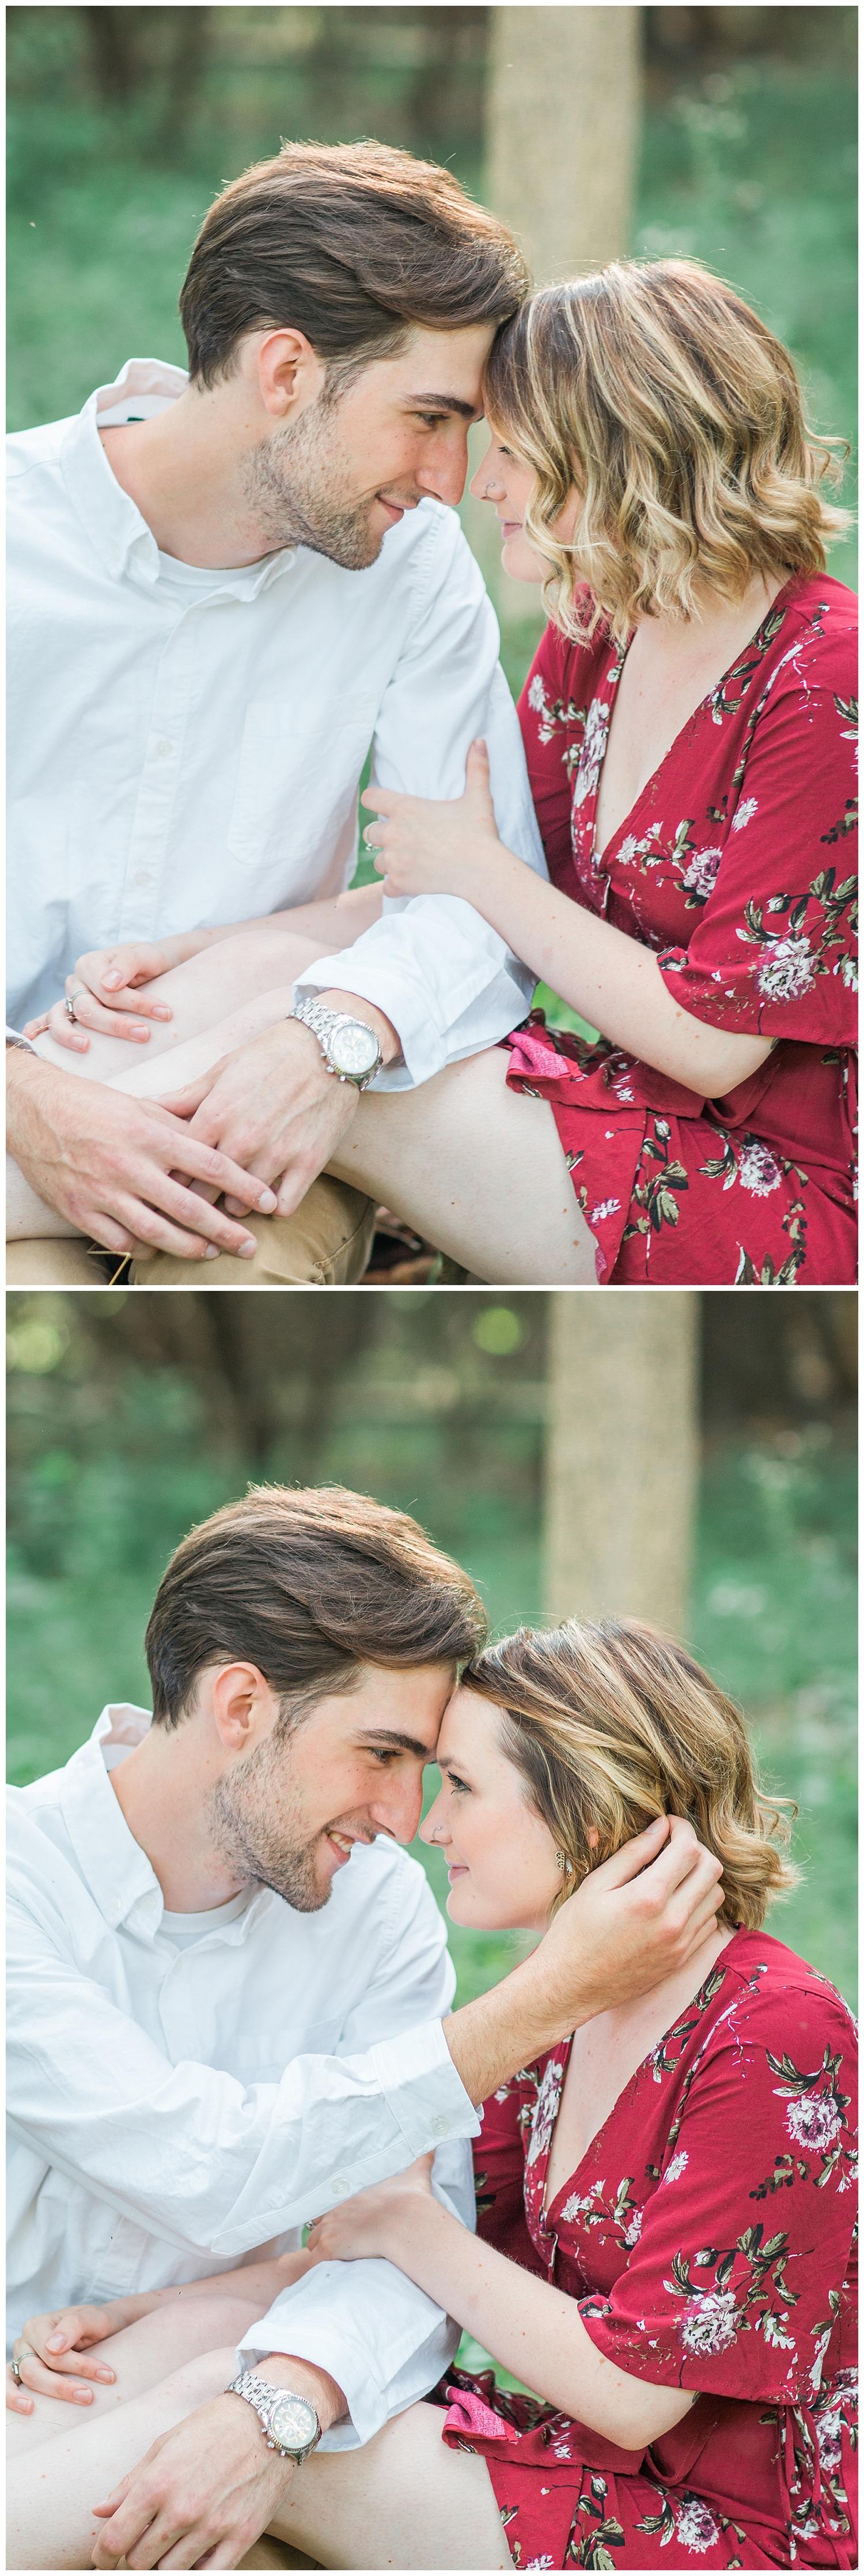 Tanya and Ryan - Sweetheart session - Lass & Beau - Geneseo NY-87_Buffalo wedding photography.jpg